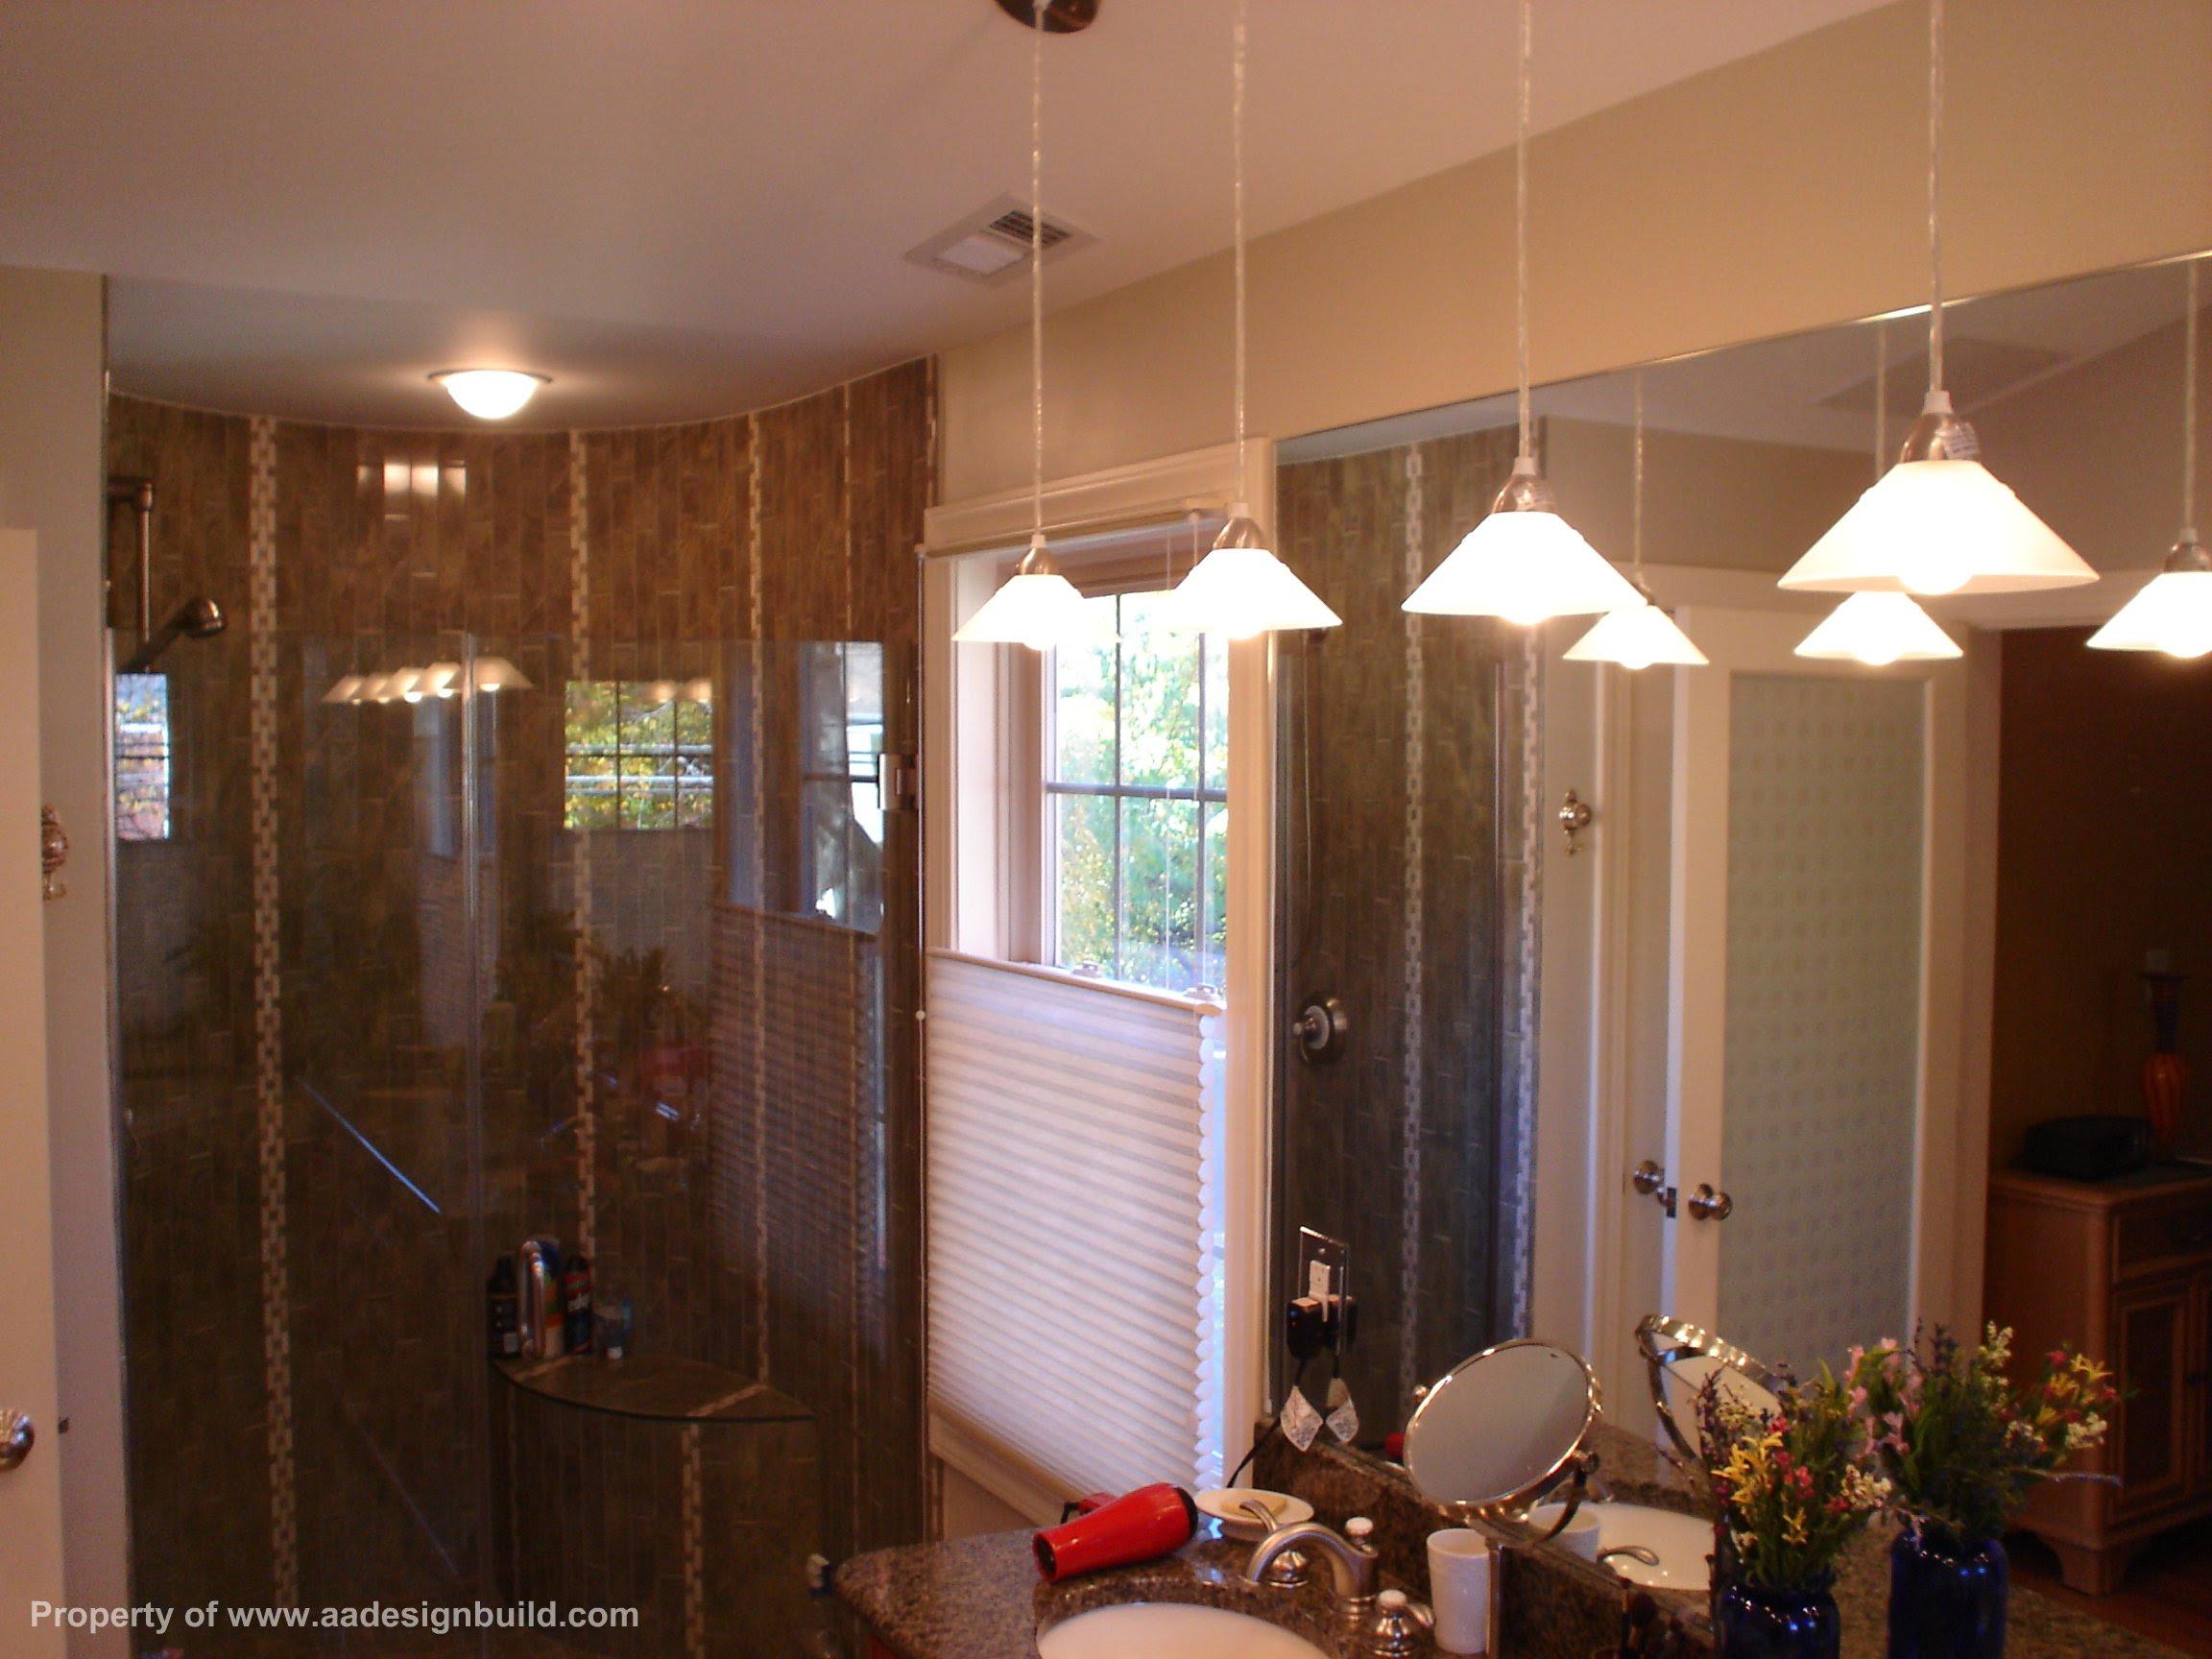 www.aadesignbuild.com, Master Bathroom Custom Design and ...